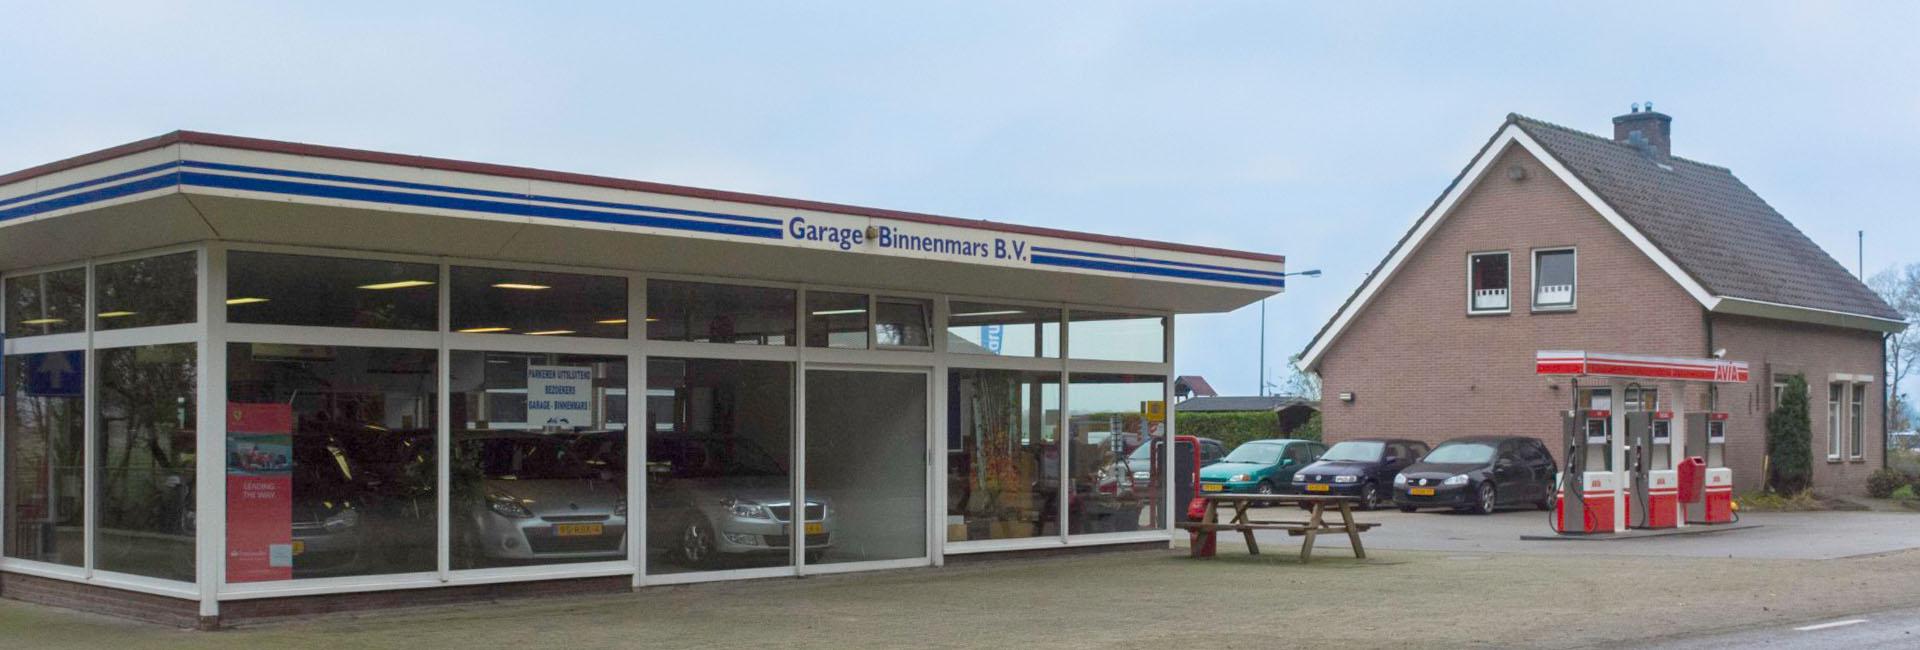 Garage_Binnenmars_visual_1